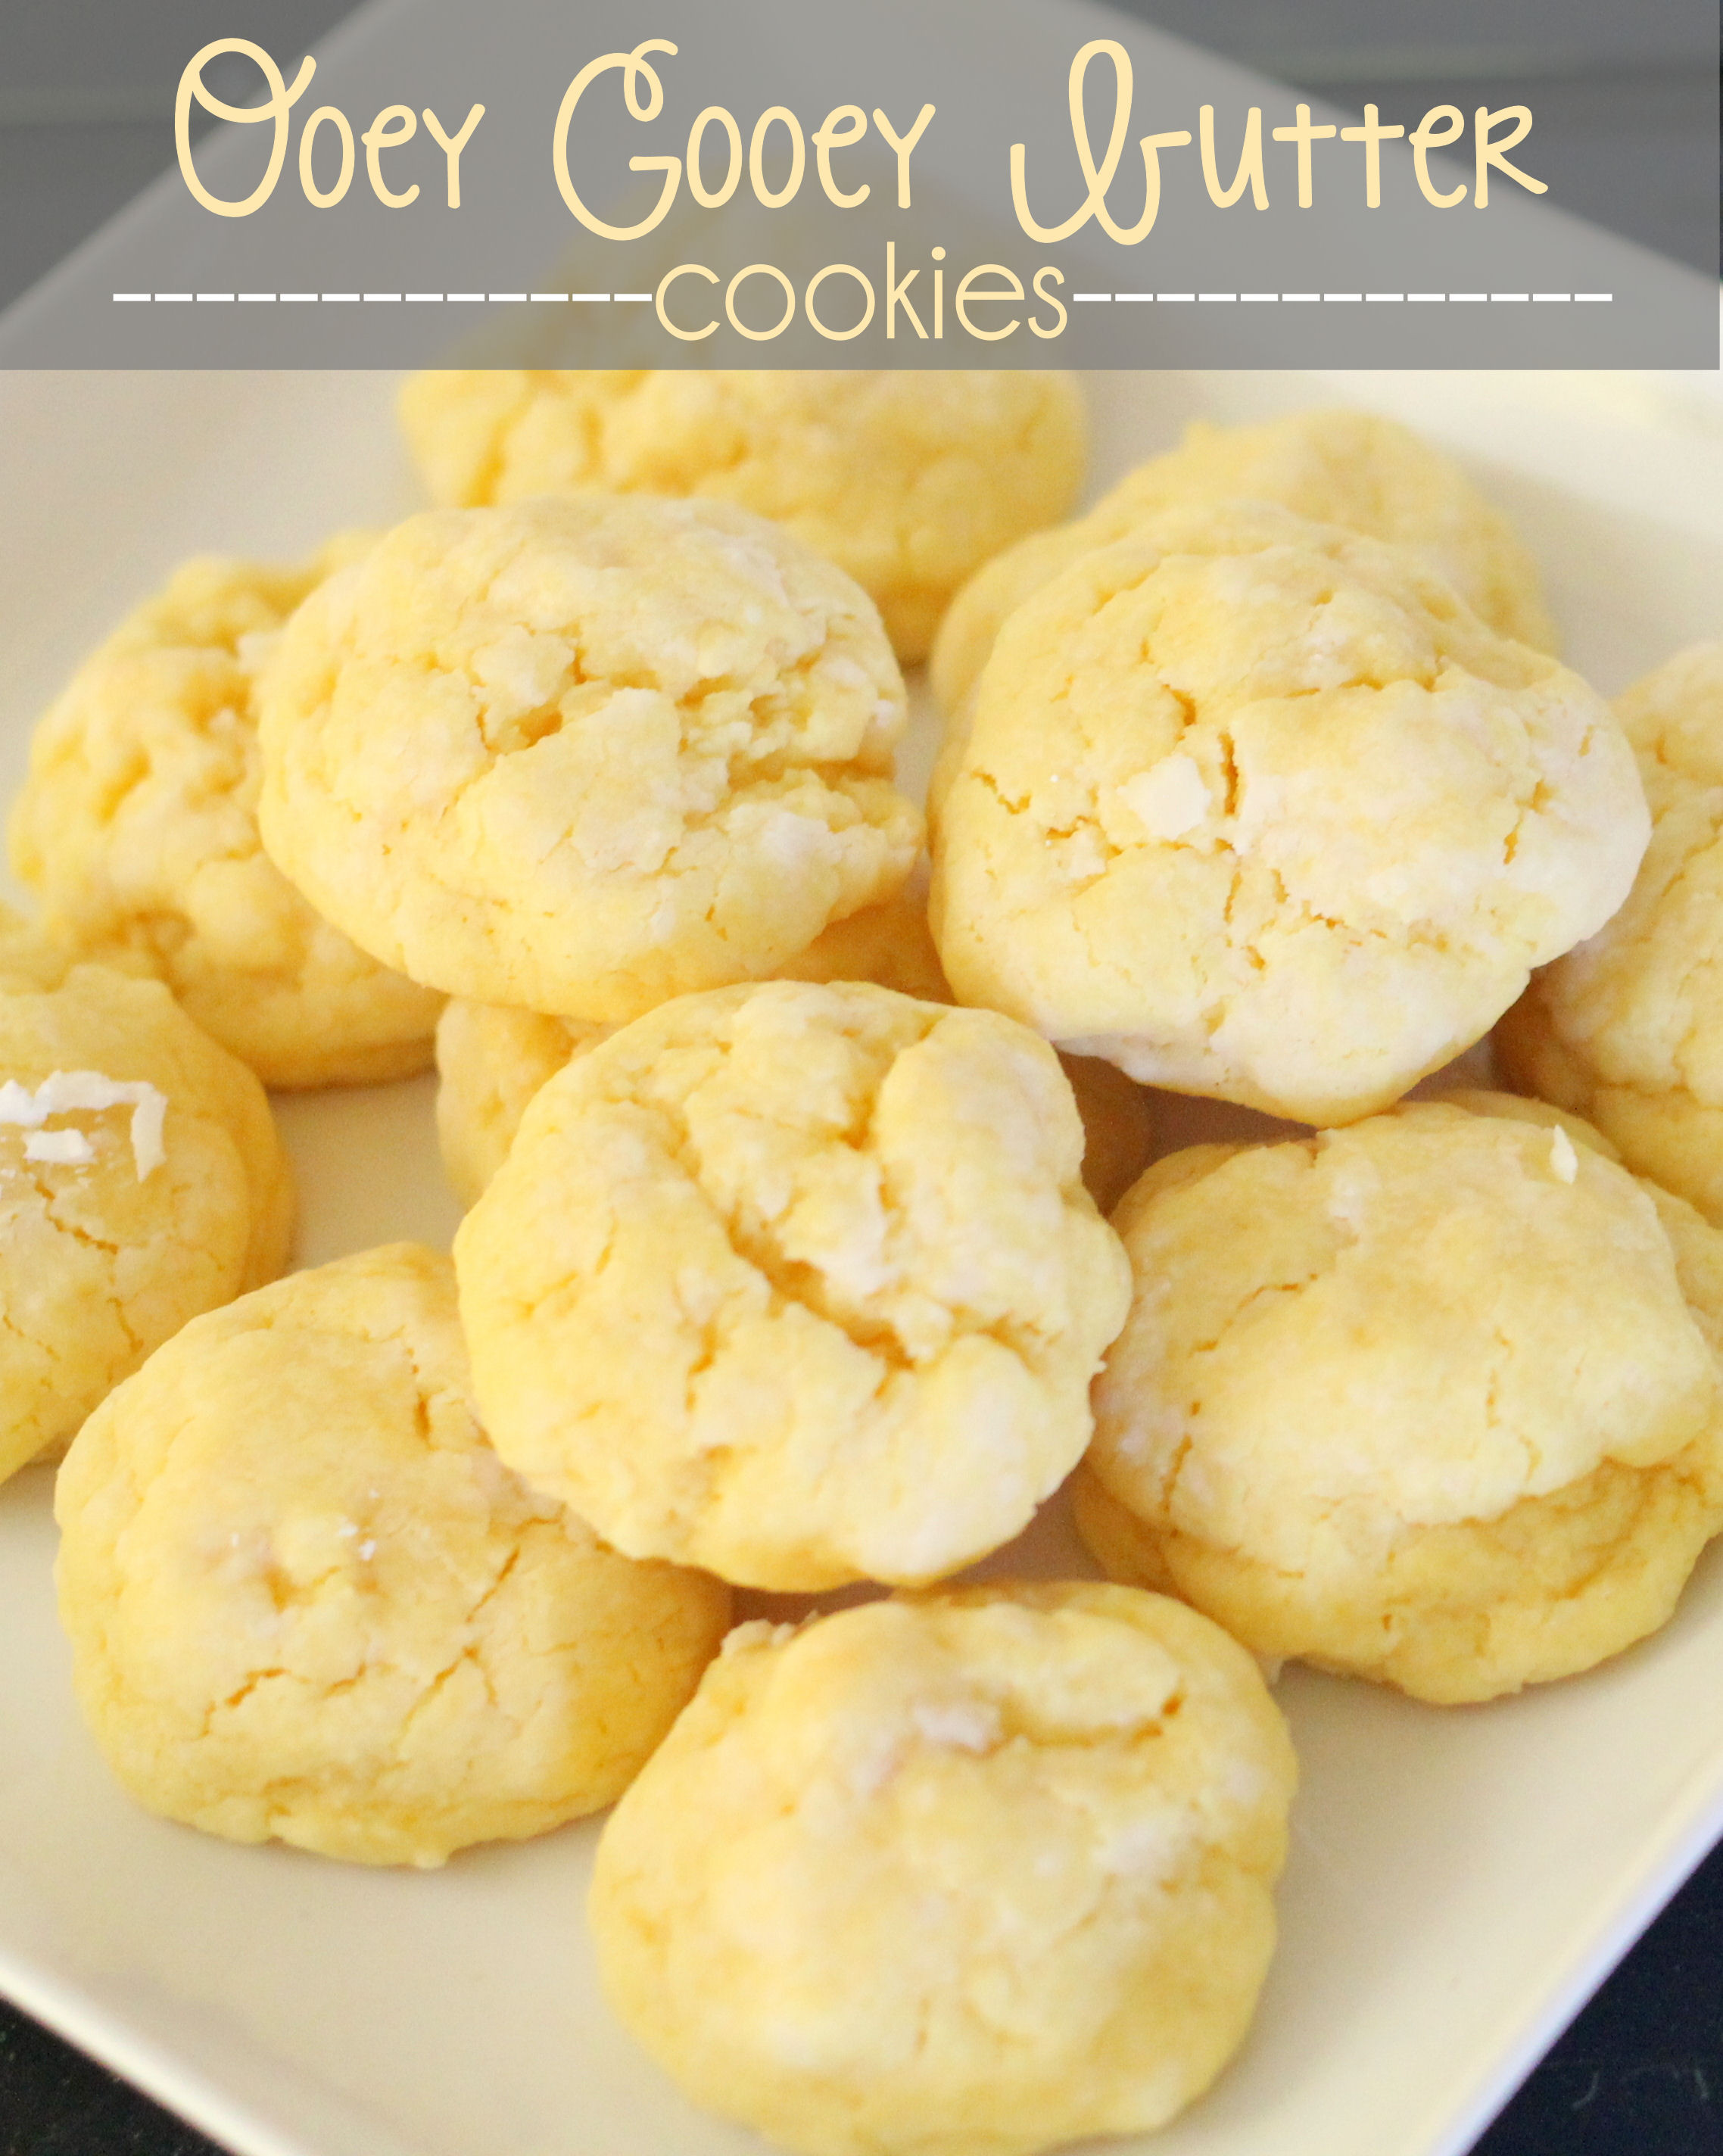 Ooey Gooey Butter Cookies  Gooey Funfetti Sugar Cookies